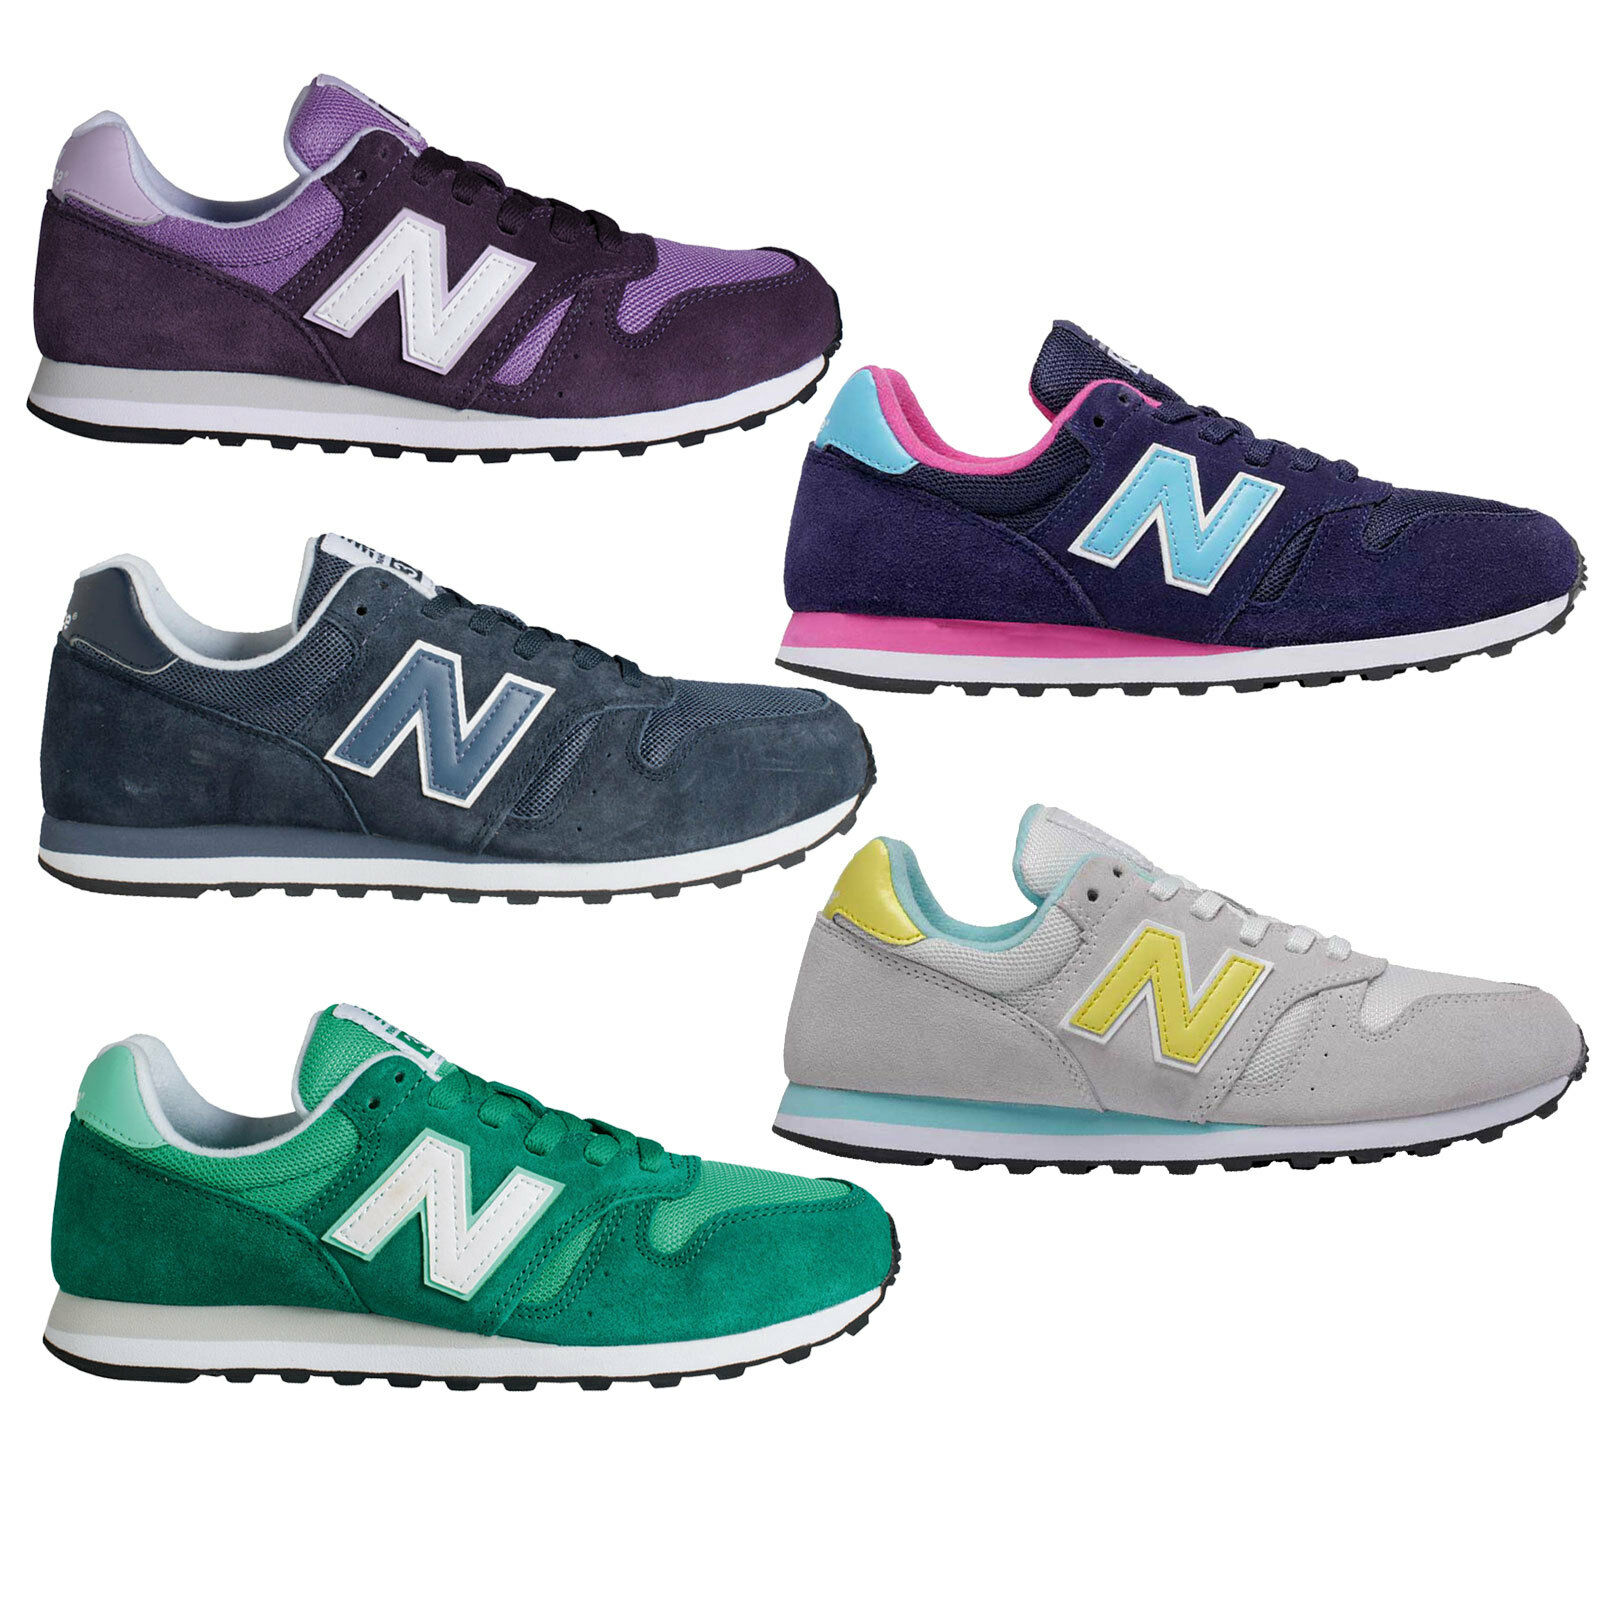 New Balance 373 Sneaker women shoes da Ginnastica shoes Stivali